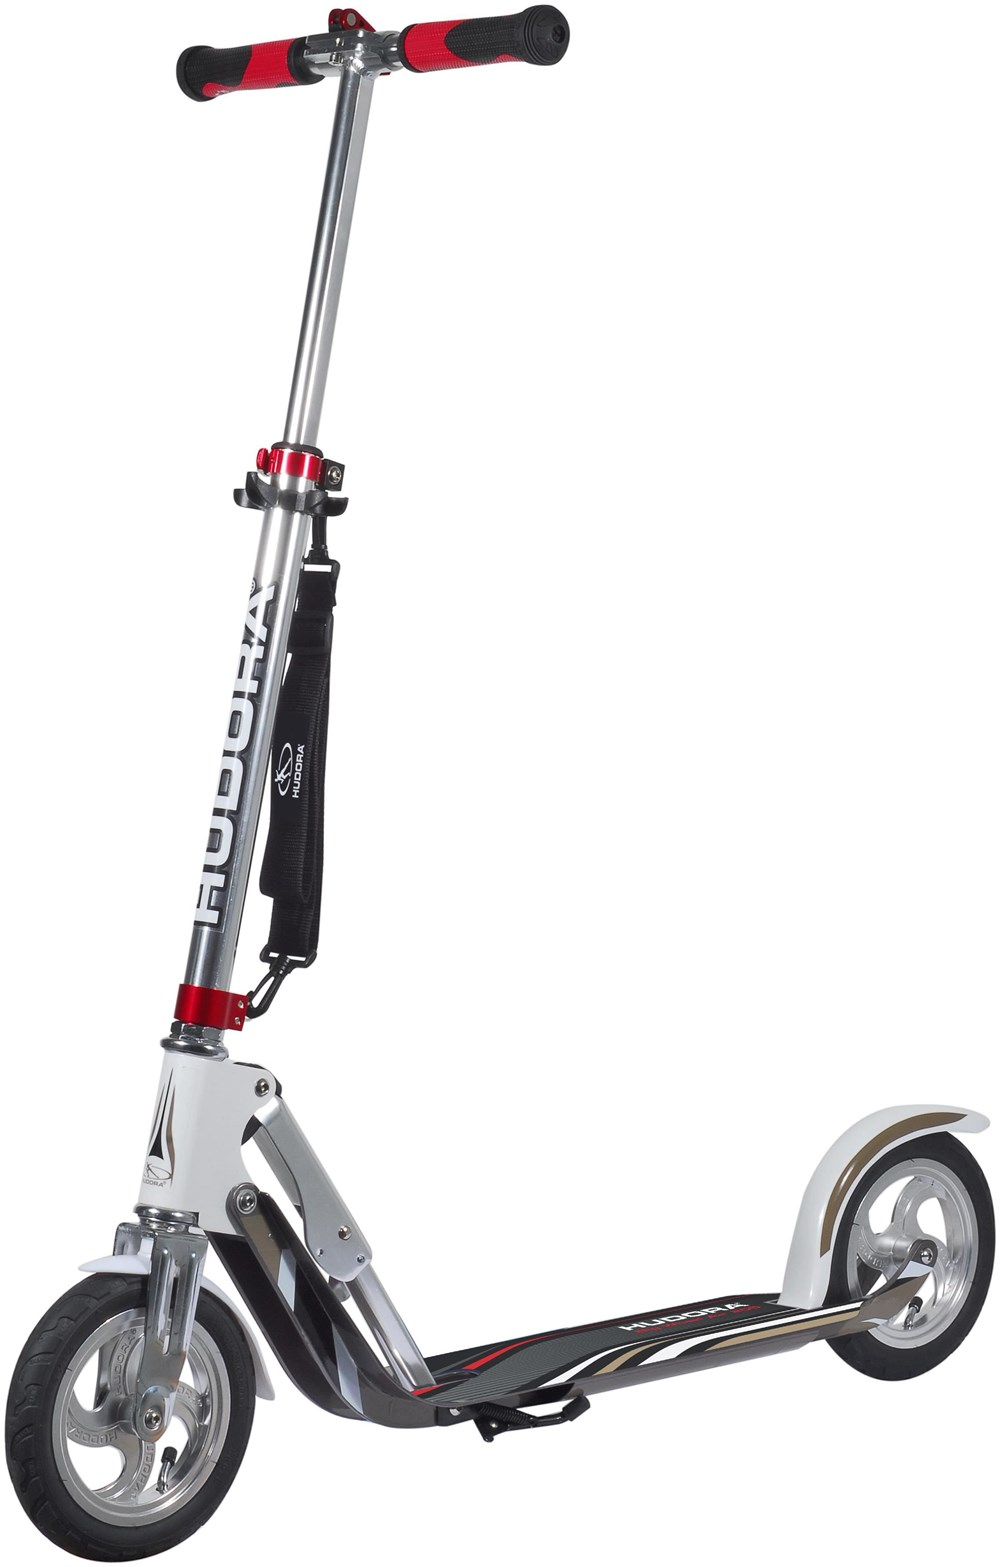 Hudora Scooter Big Wheel AIR 205 Roller silber/weiß - Preisvergleich